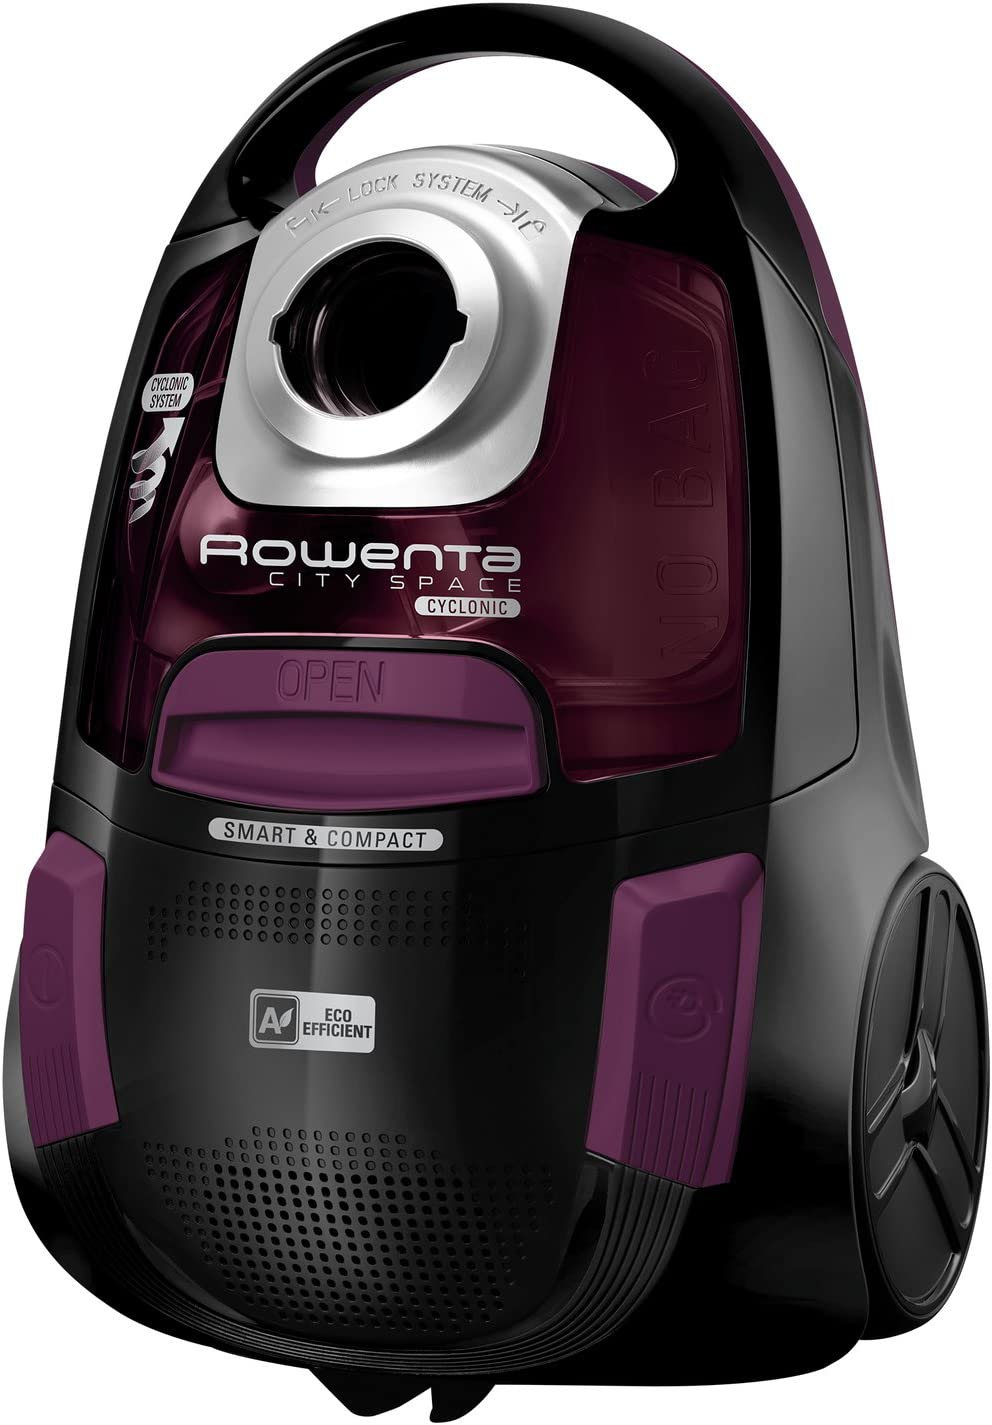 Rowenta City Space RO2759 - Aspiradora (750 W, Aspiradora ...